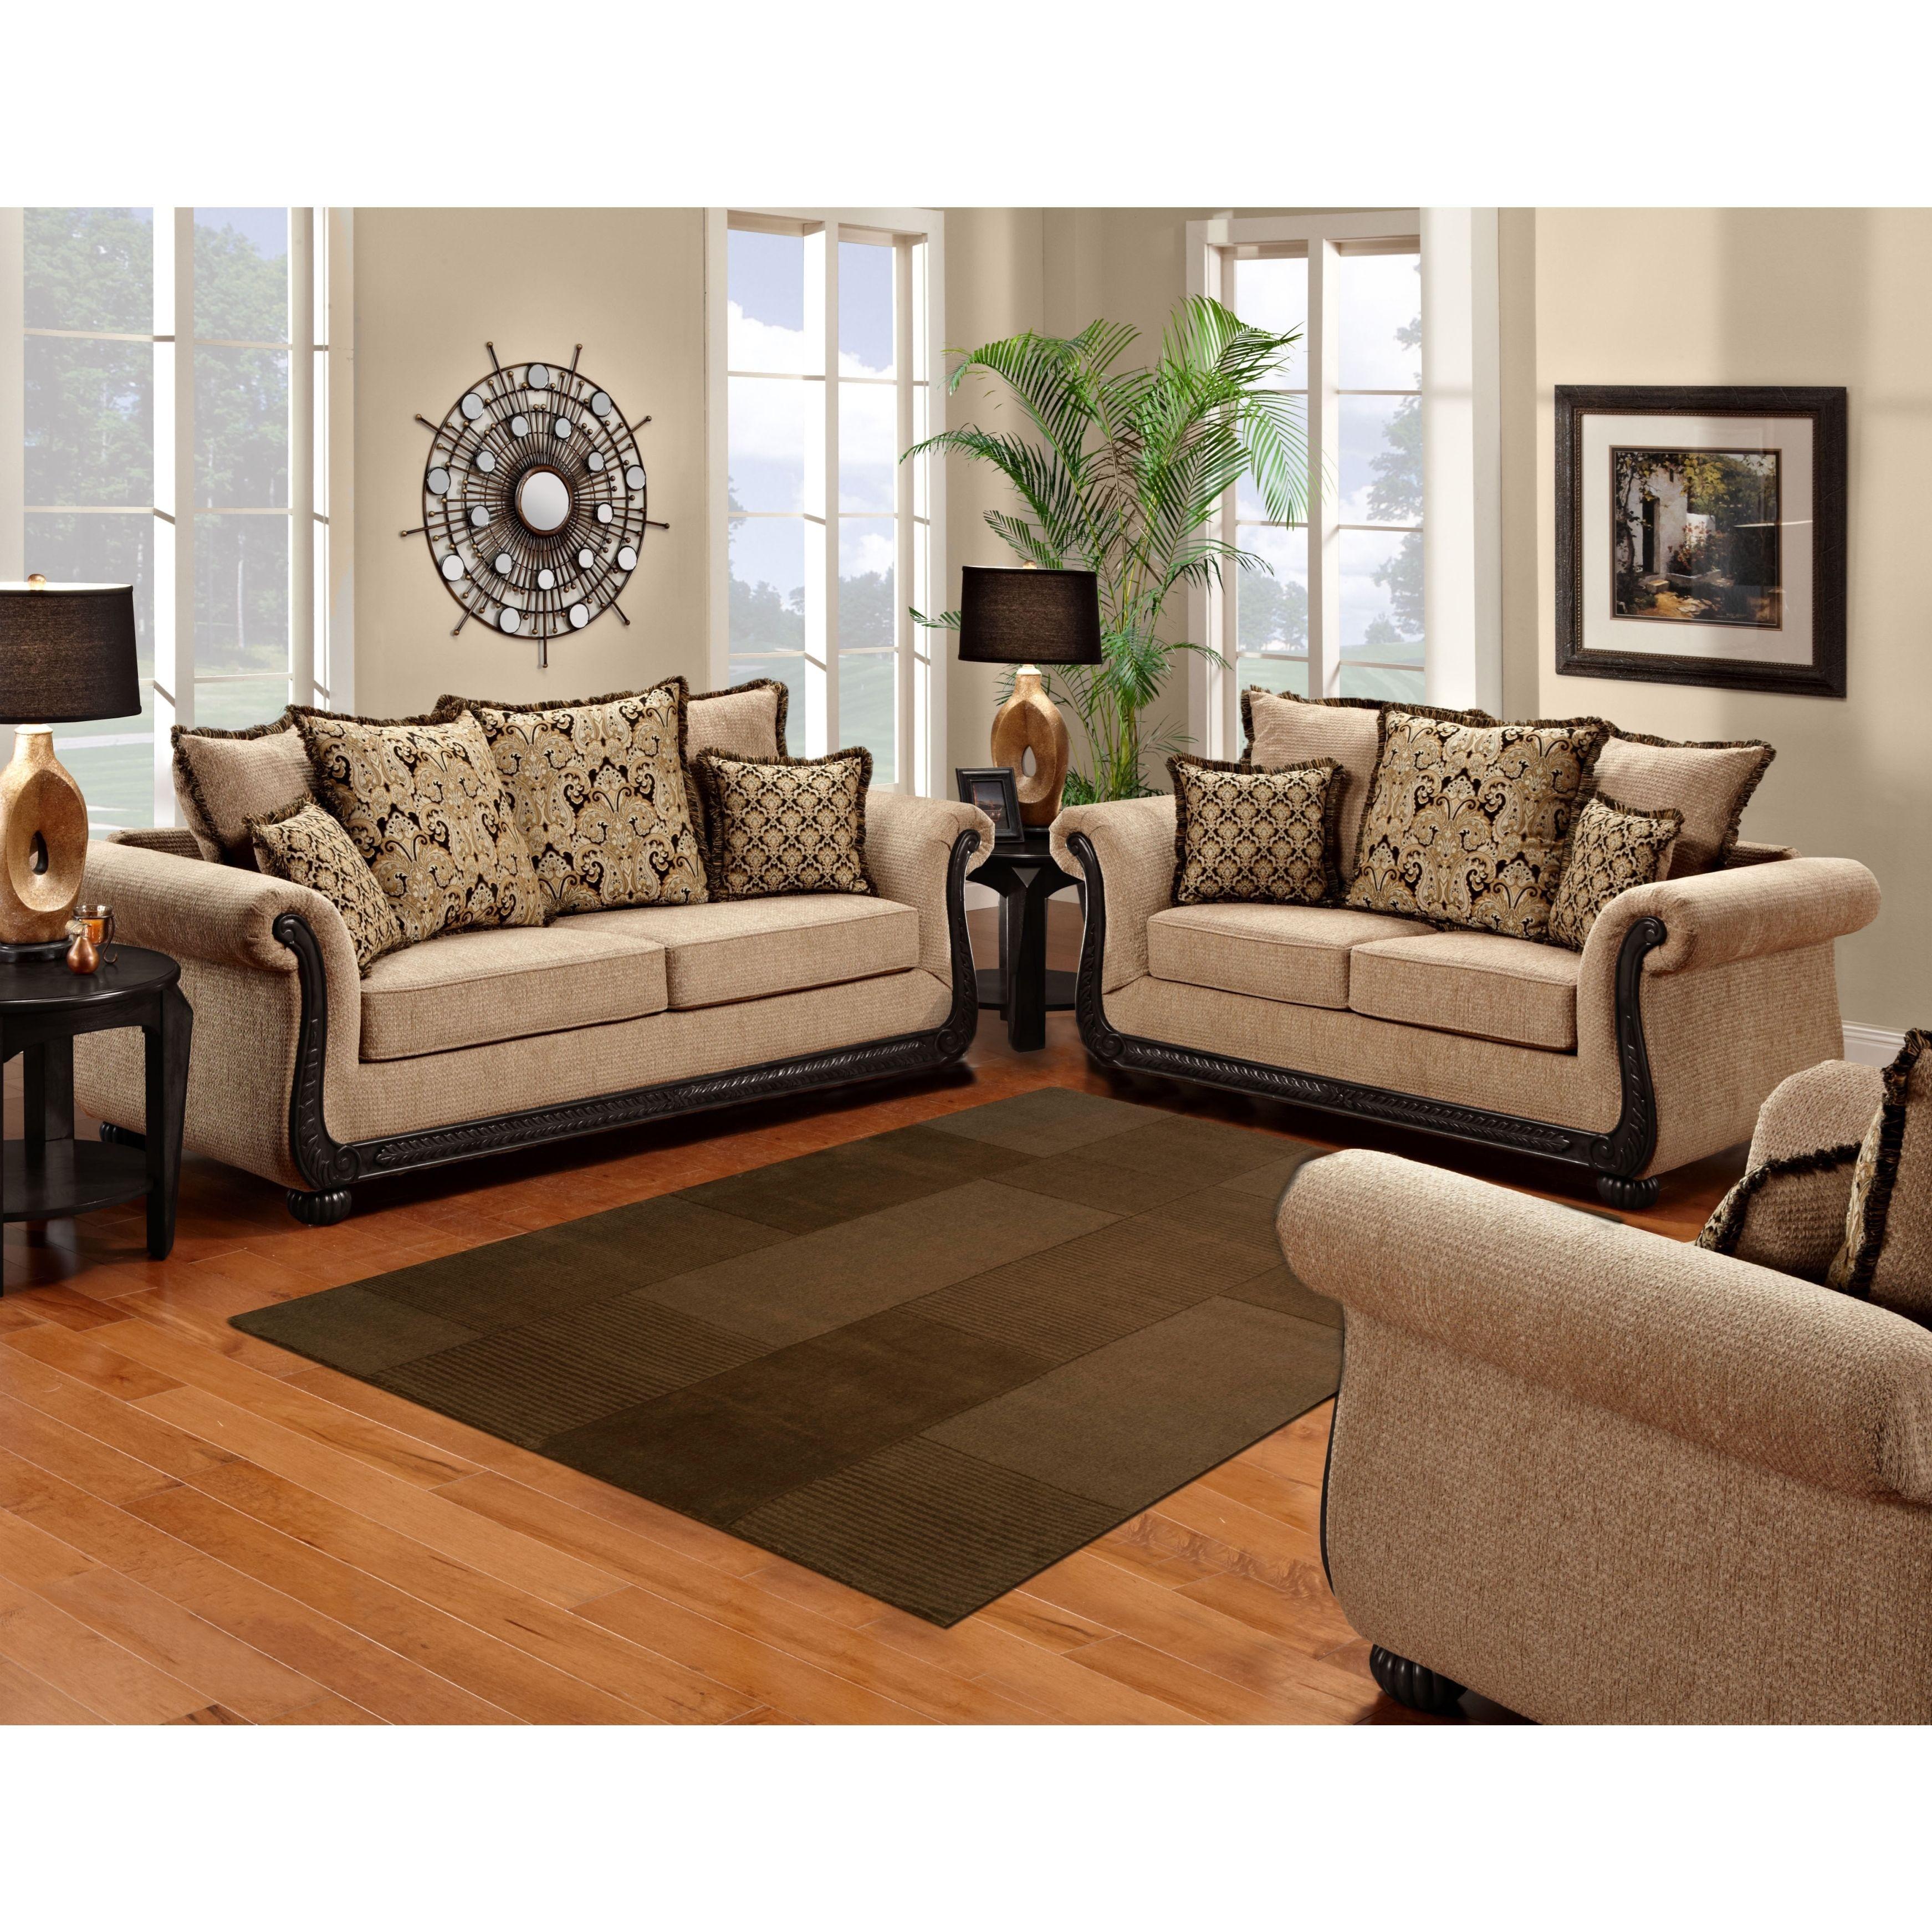 Sofa Trendz Bowen Taupe Brown Microfiber Sofa